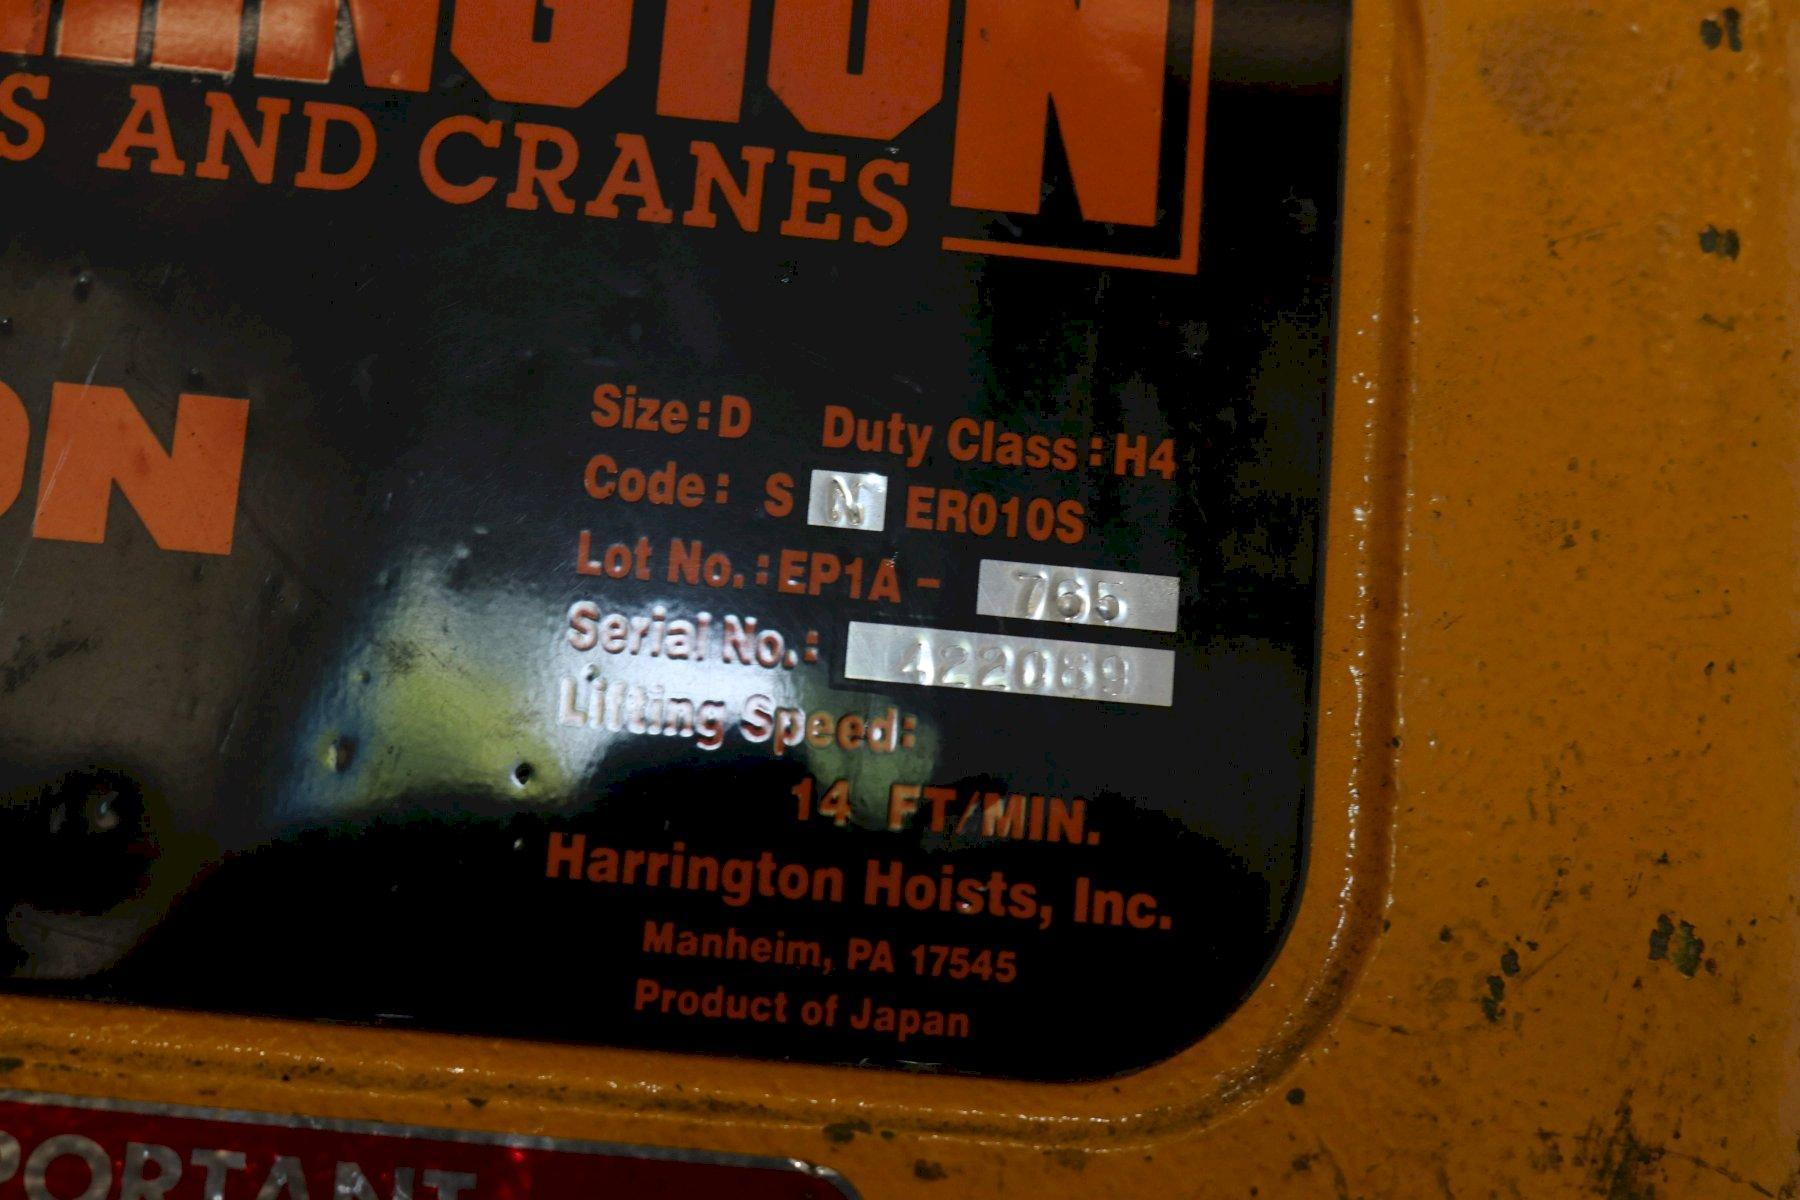 1 TON HARRINGTON SINGLE PHASE ELECTIC CHAIN HOIST: STOCK #69517